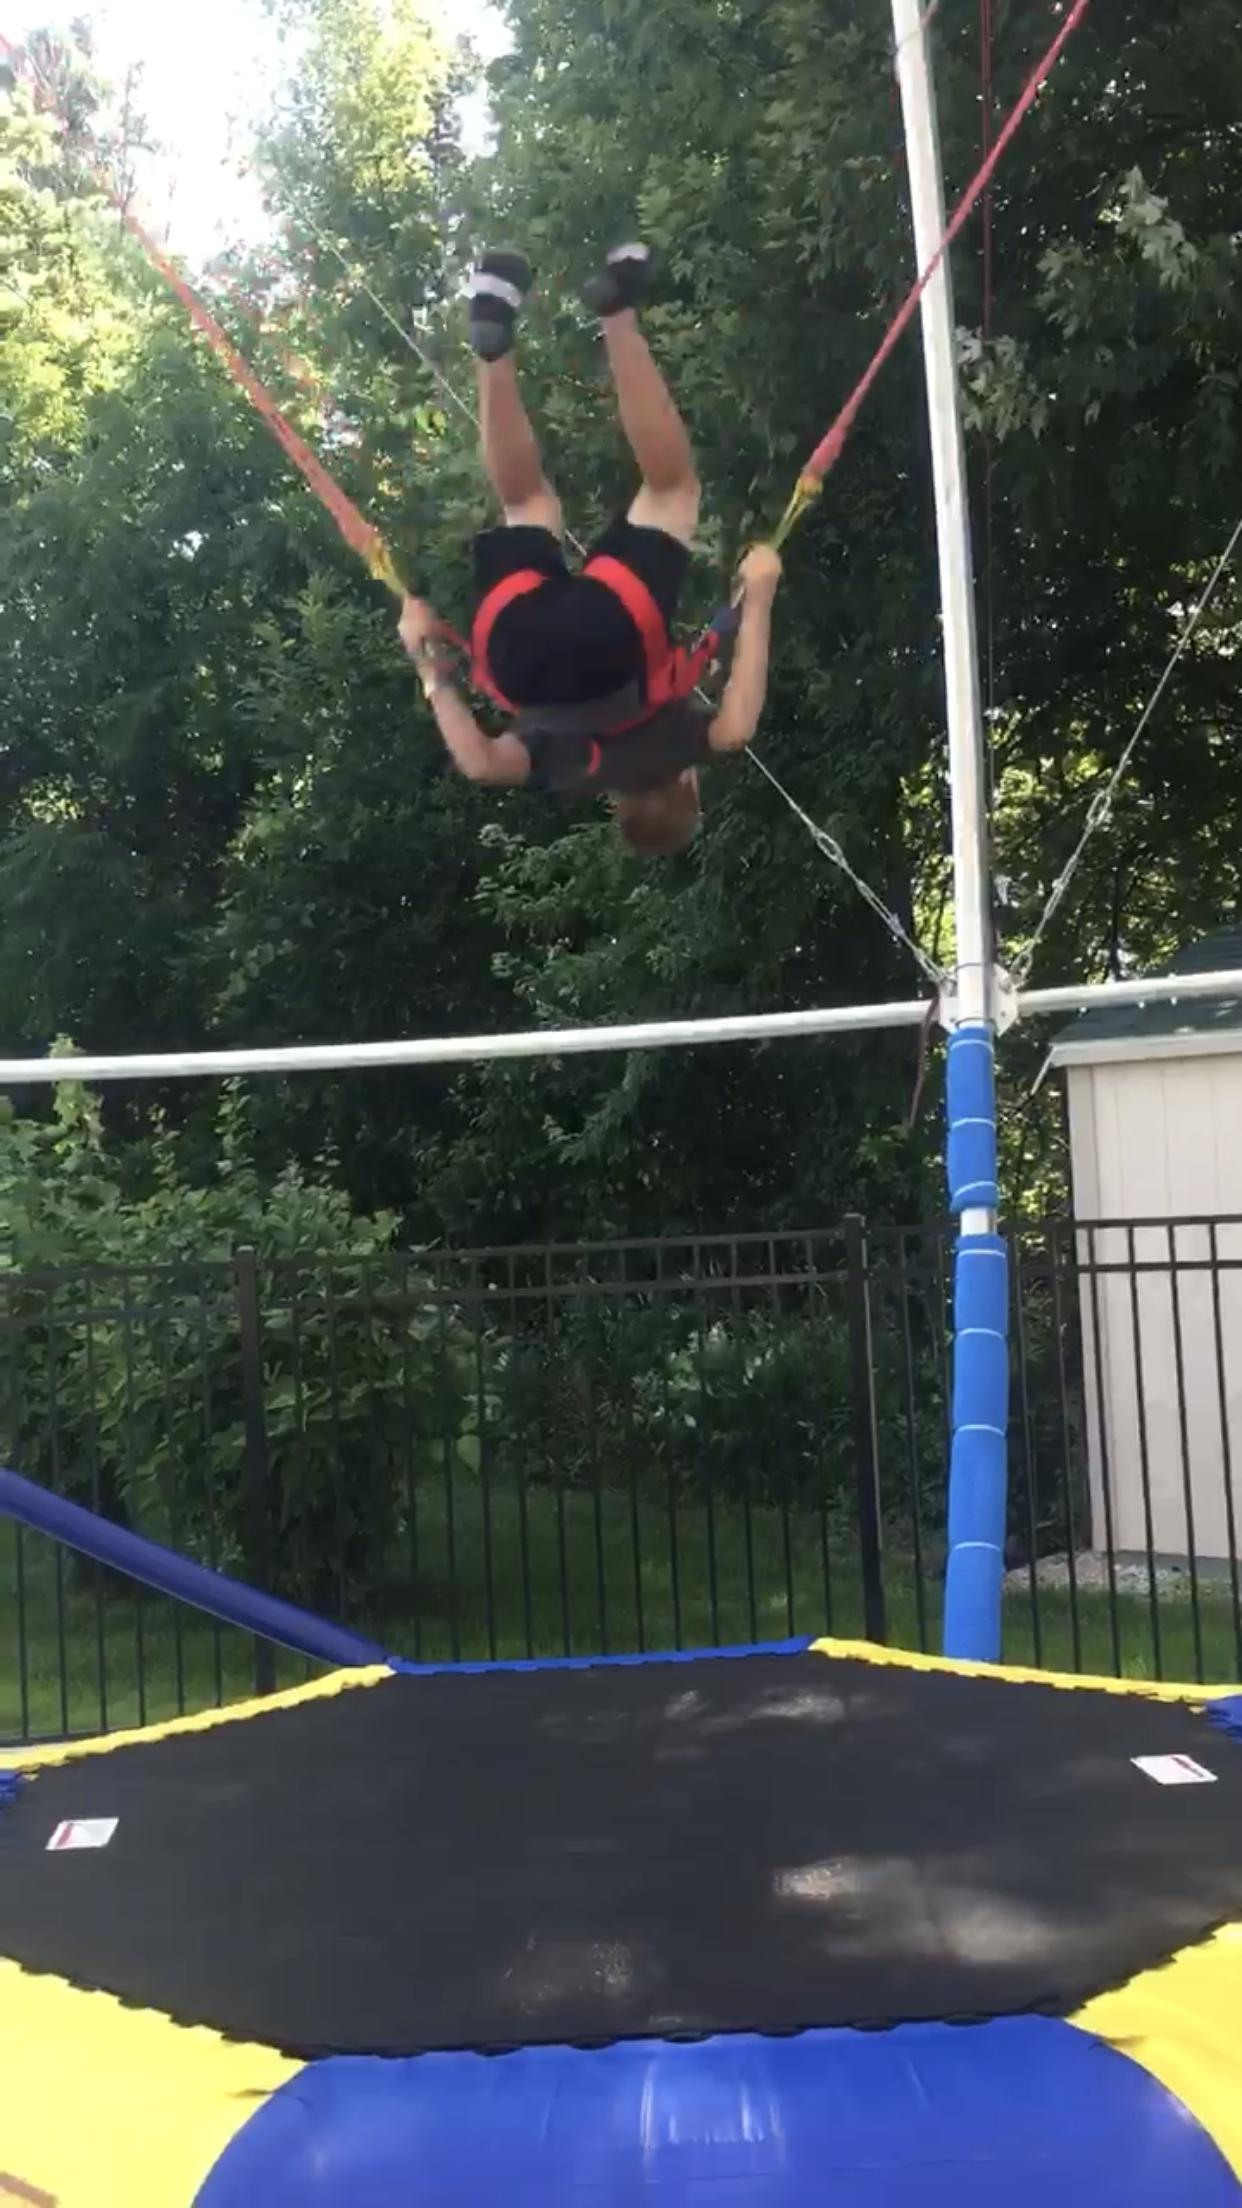 Euro Bungy, kid doing flips